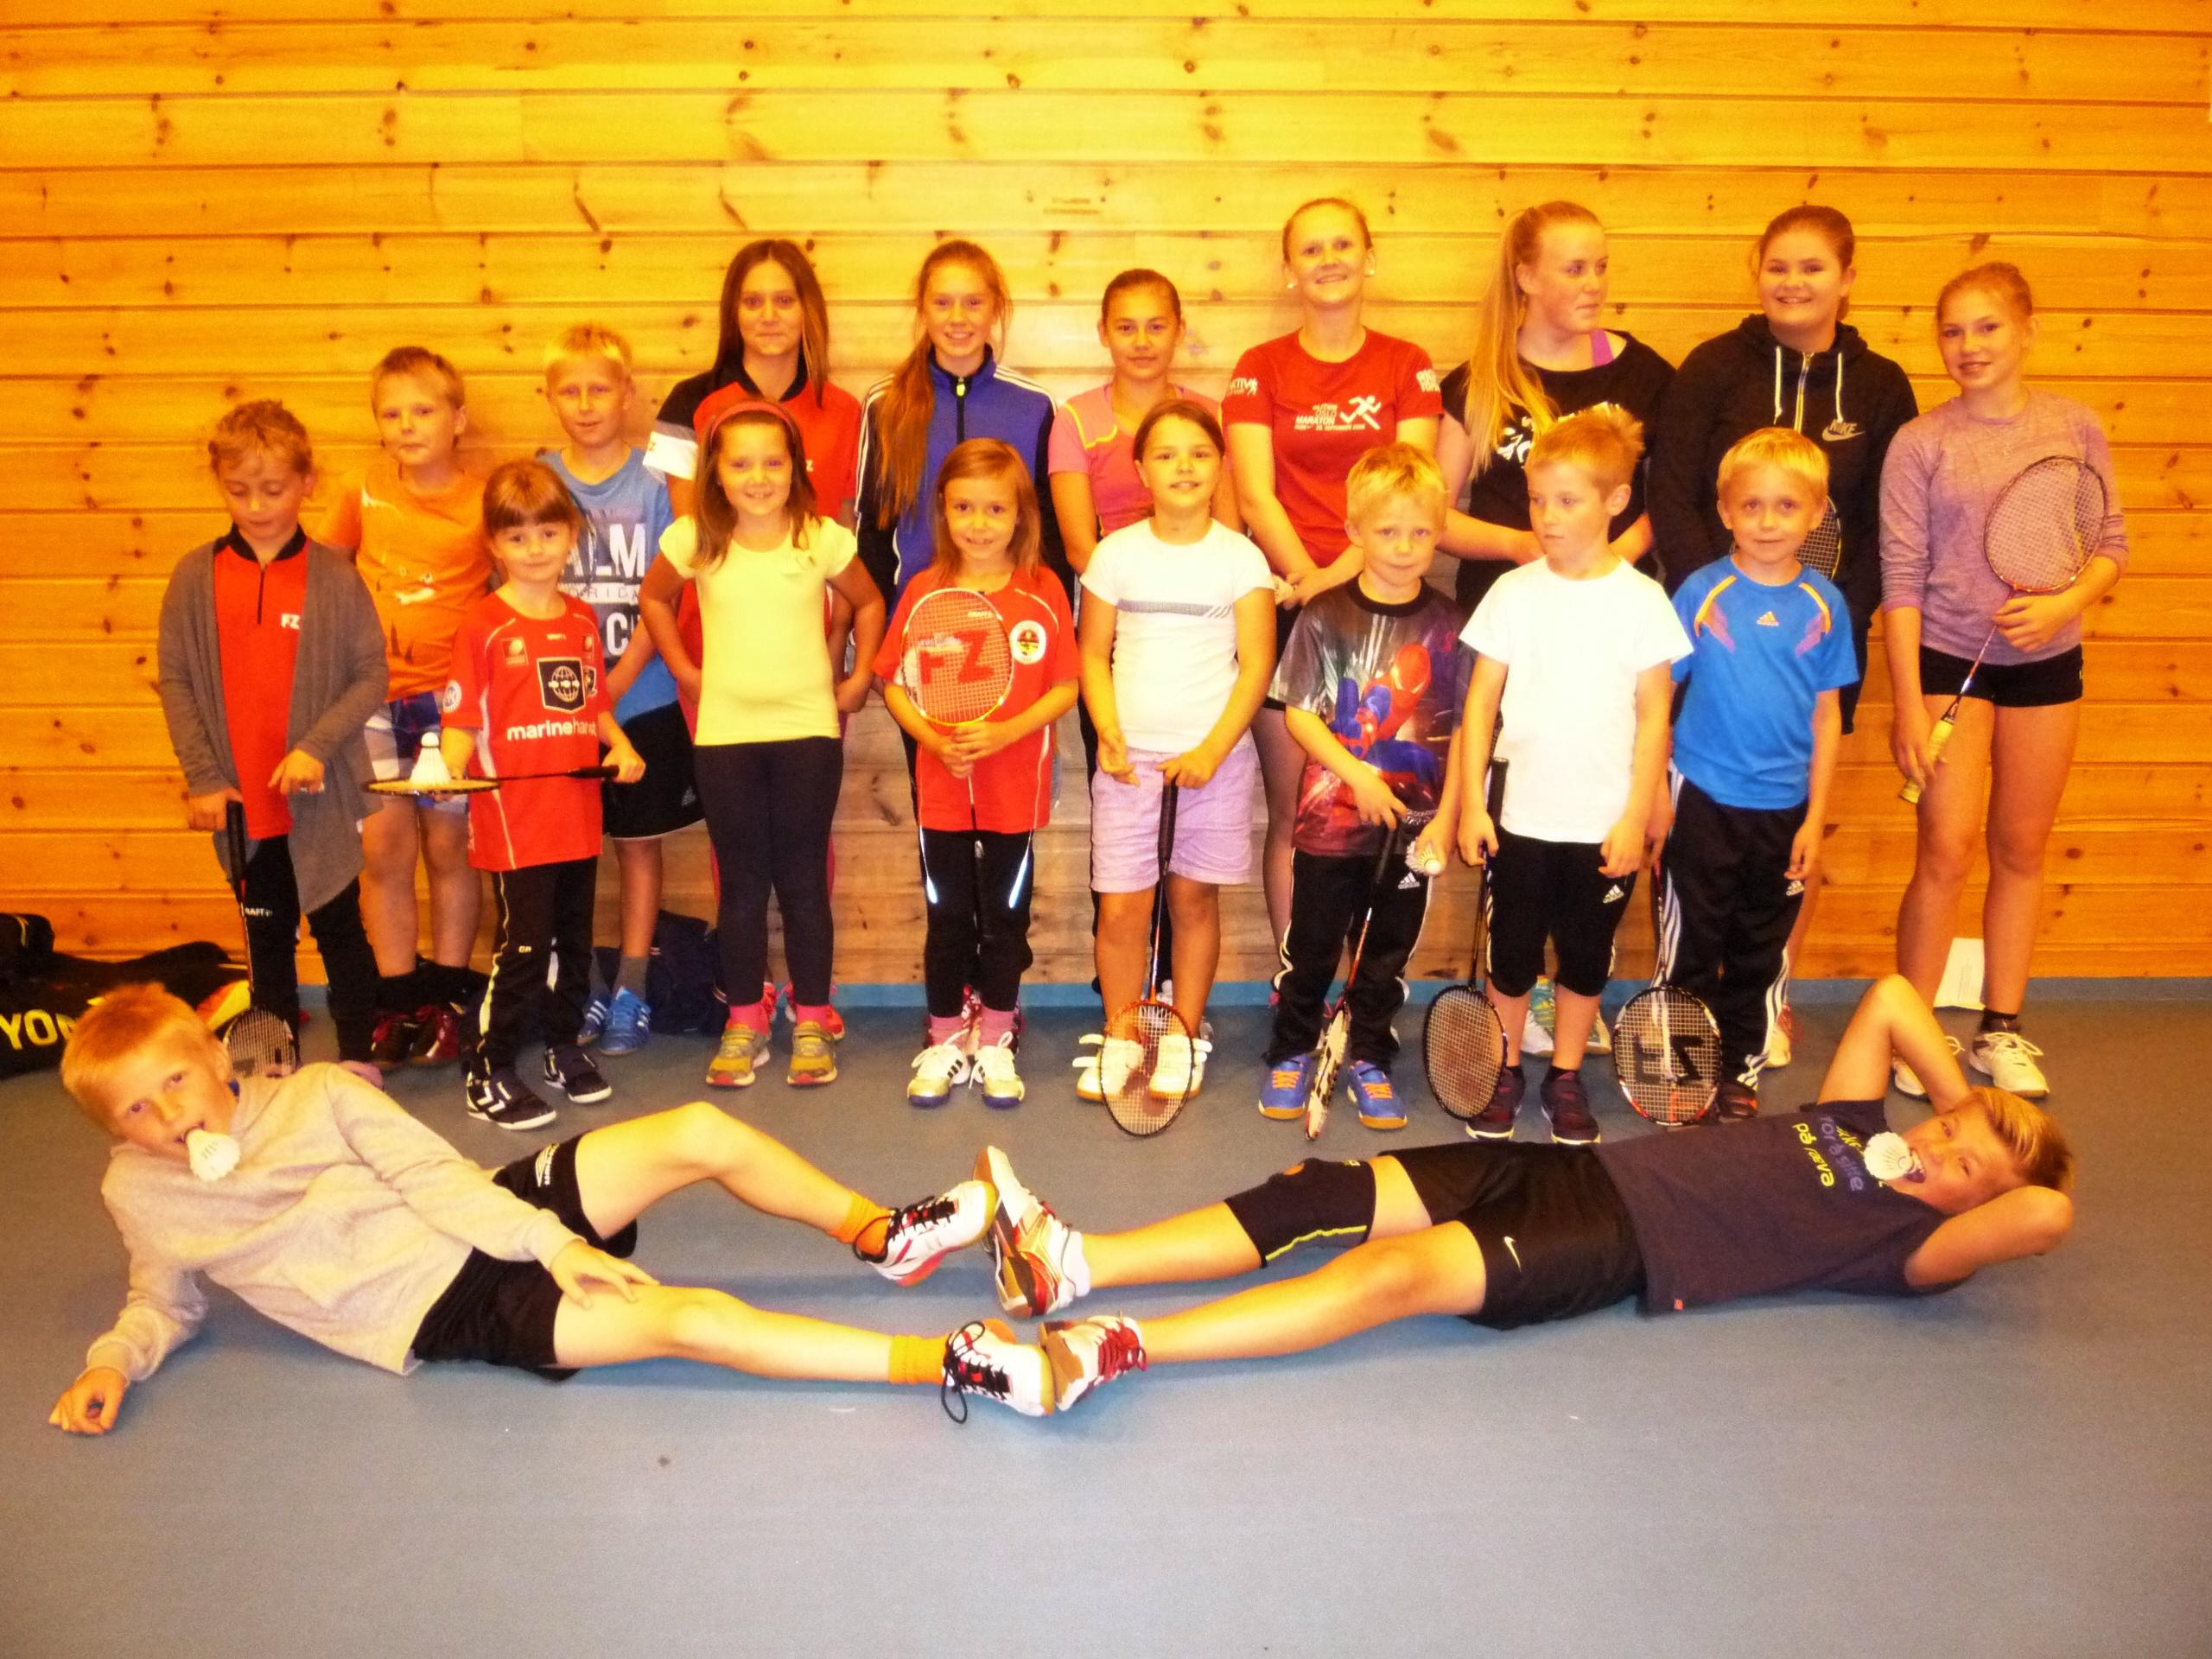 Nybegynnerkurs i badminton